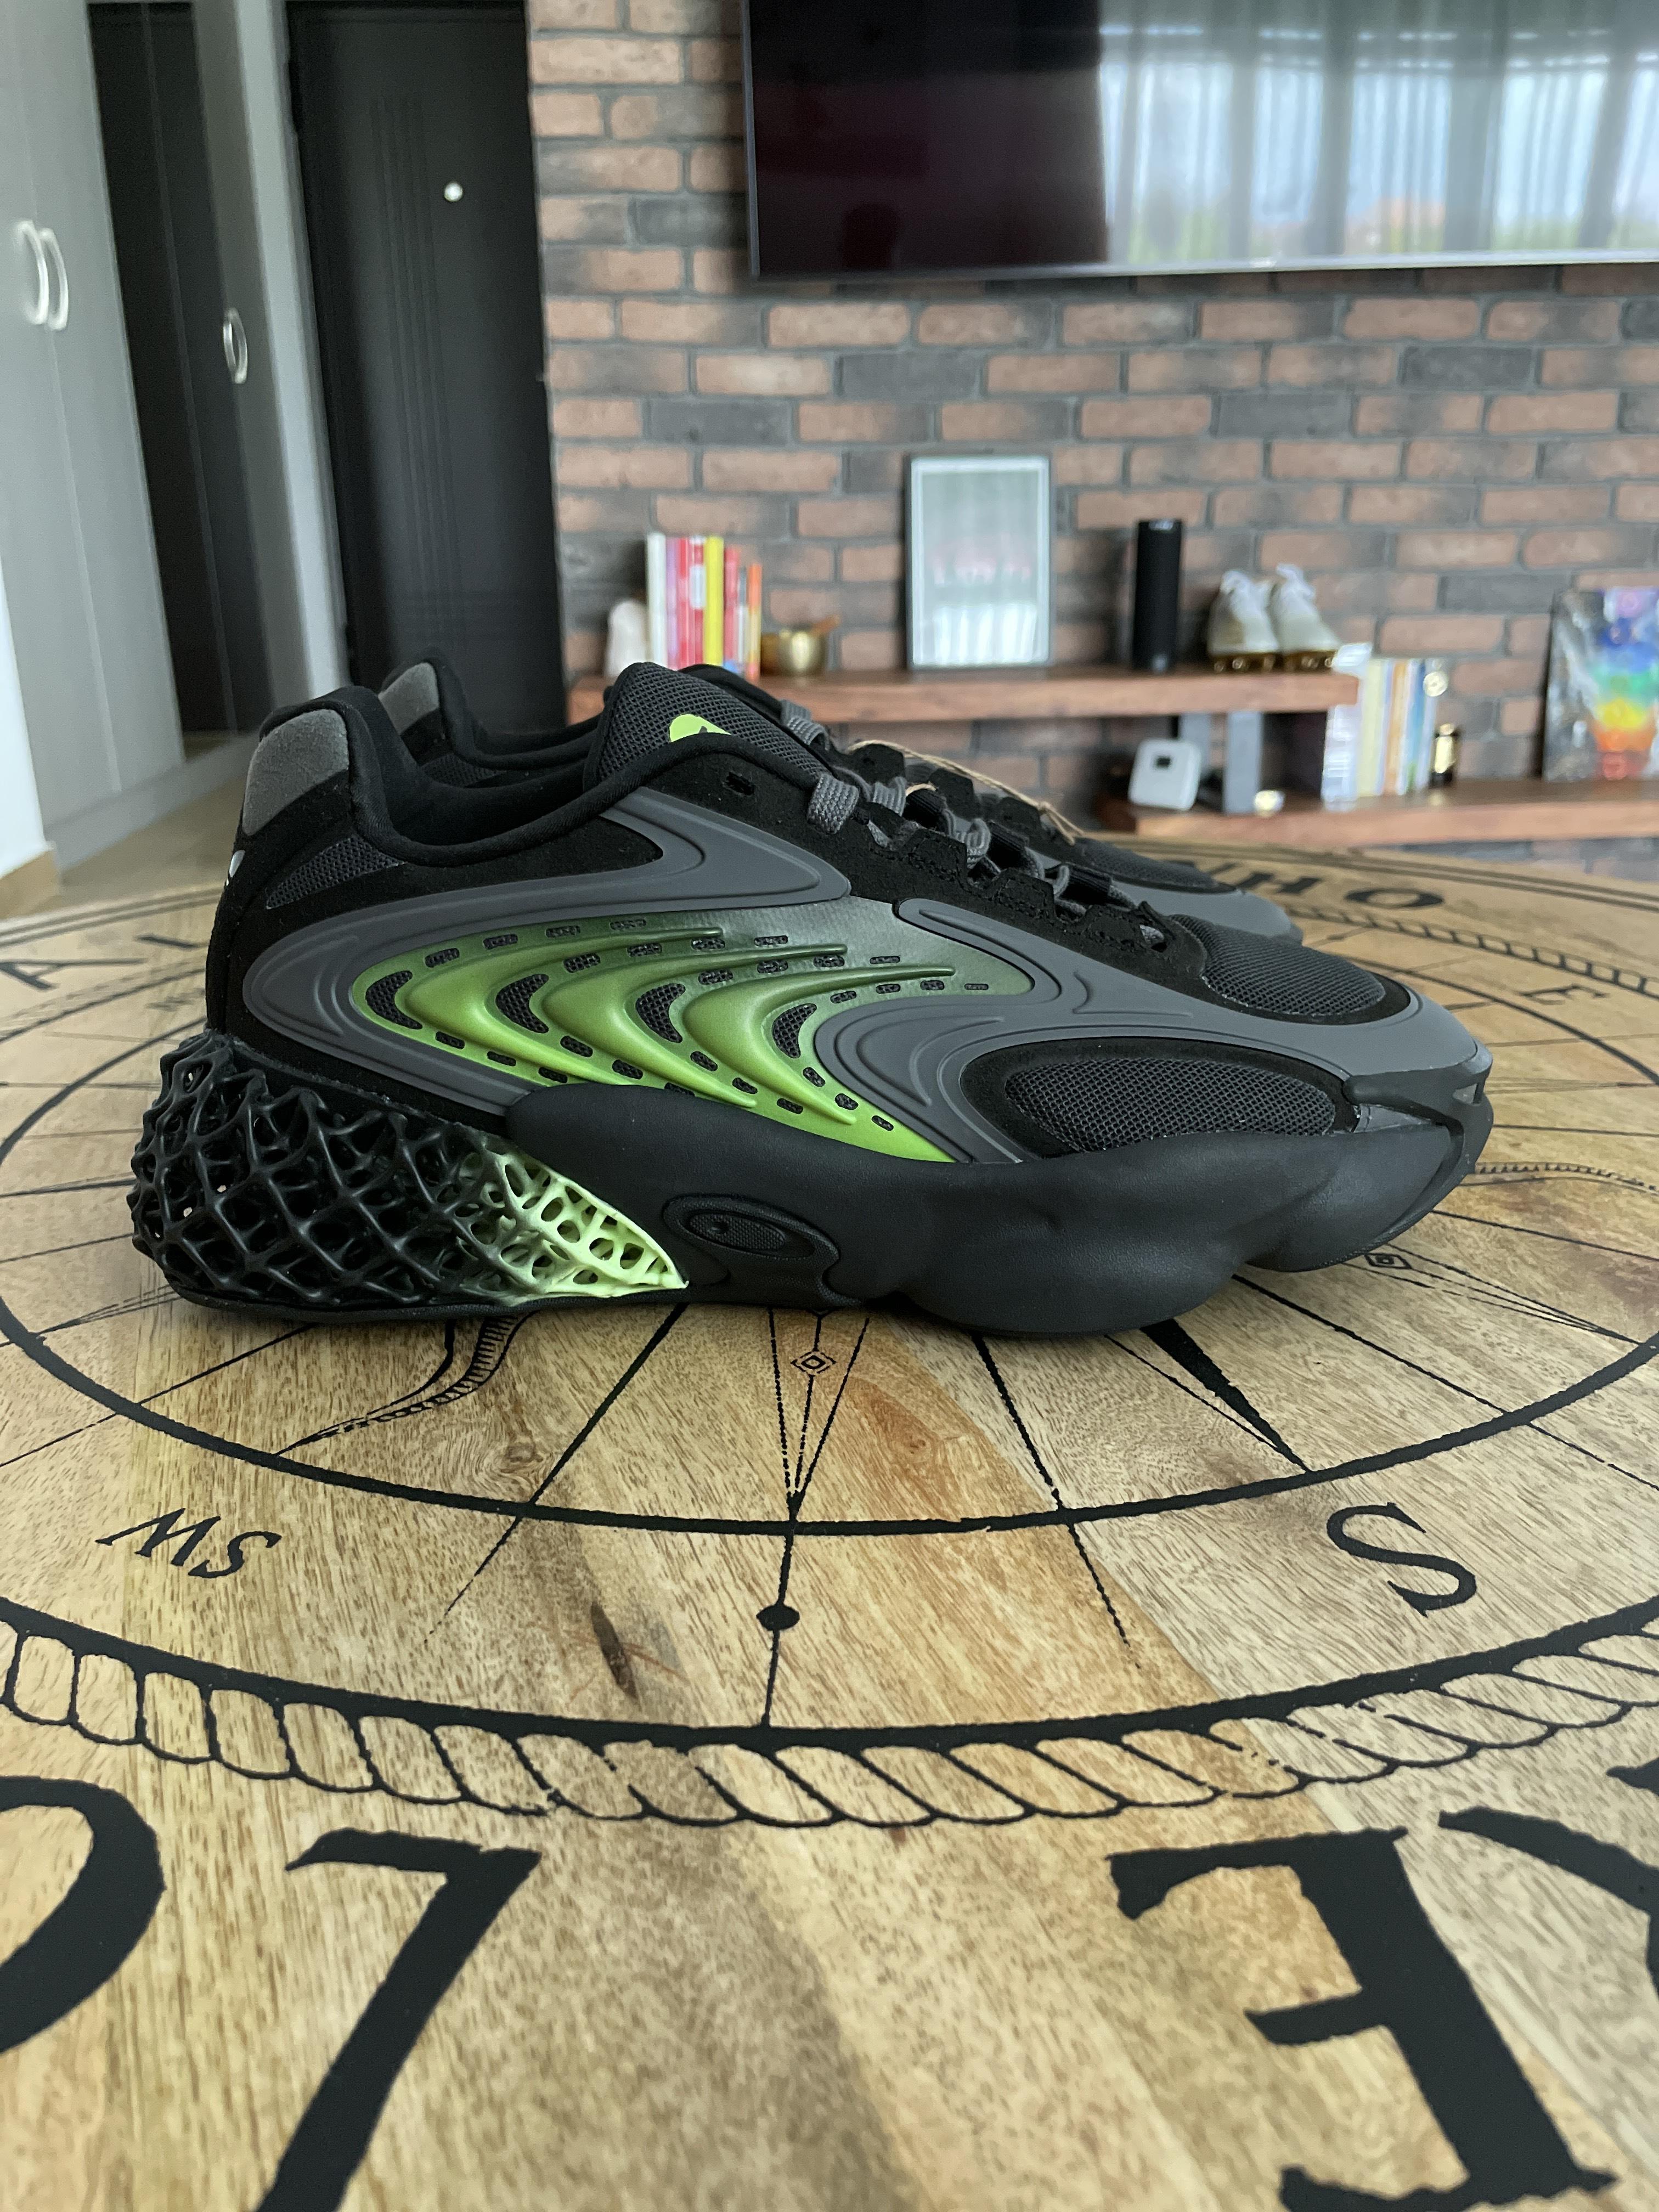 Adidas - $600 - Size 9